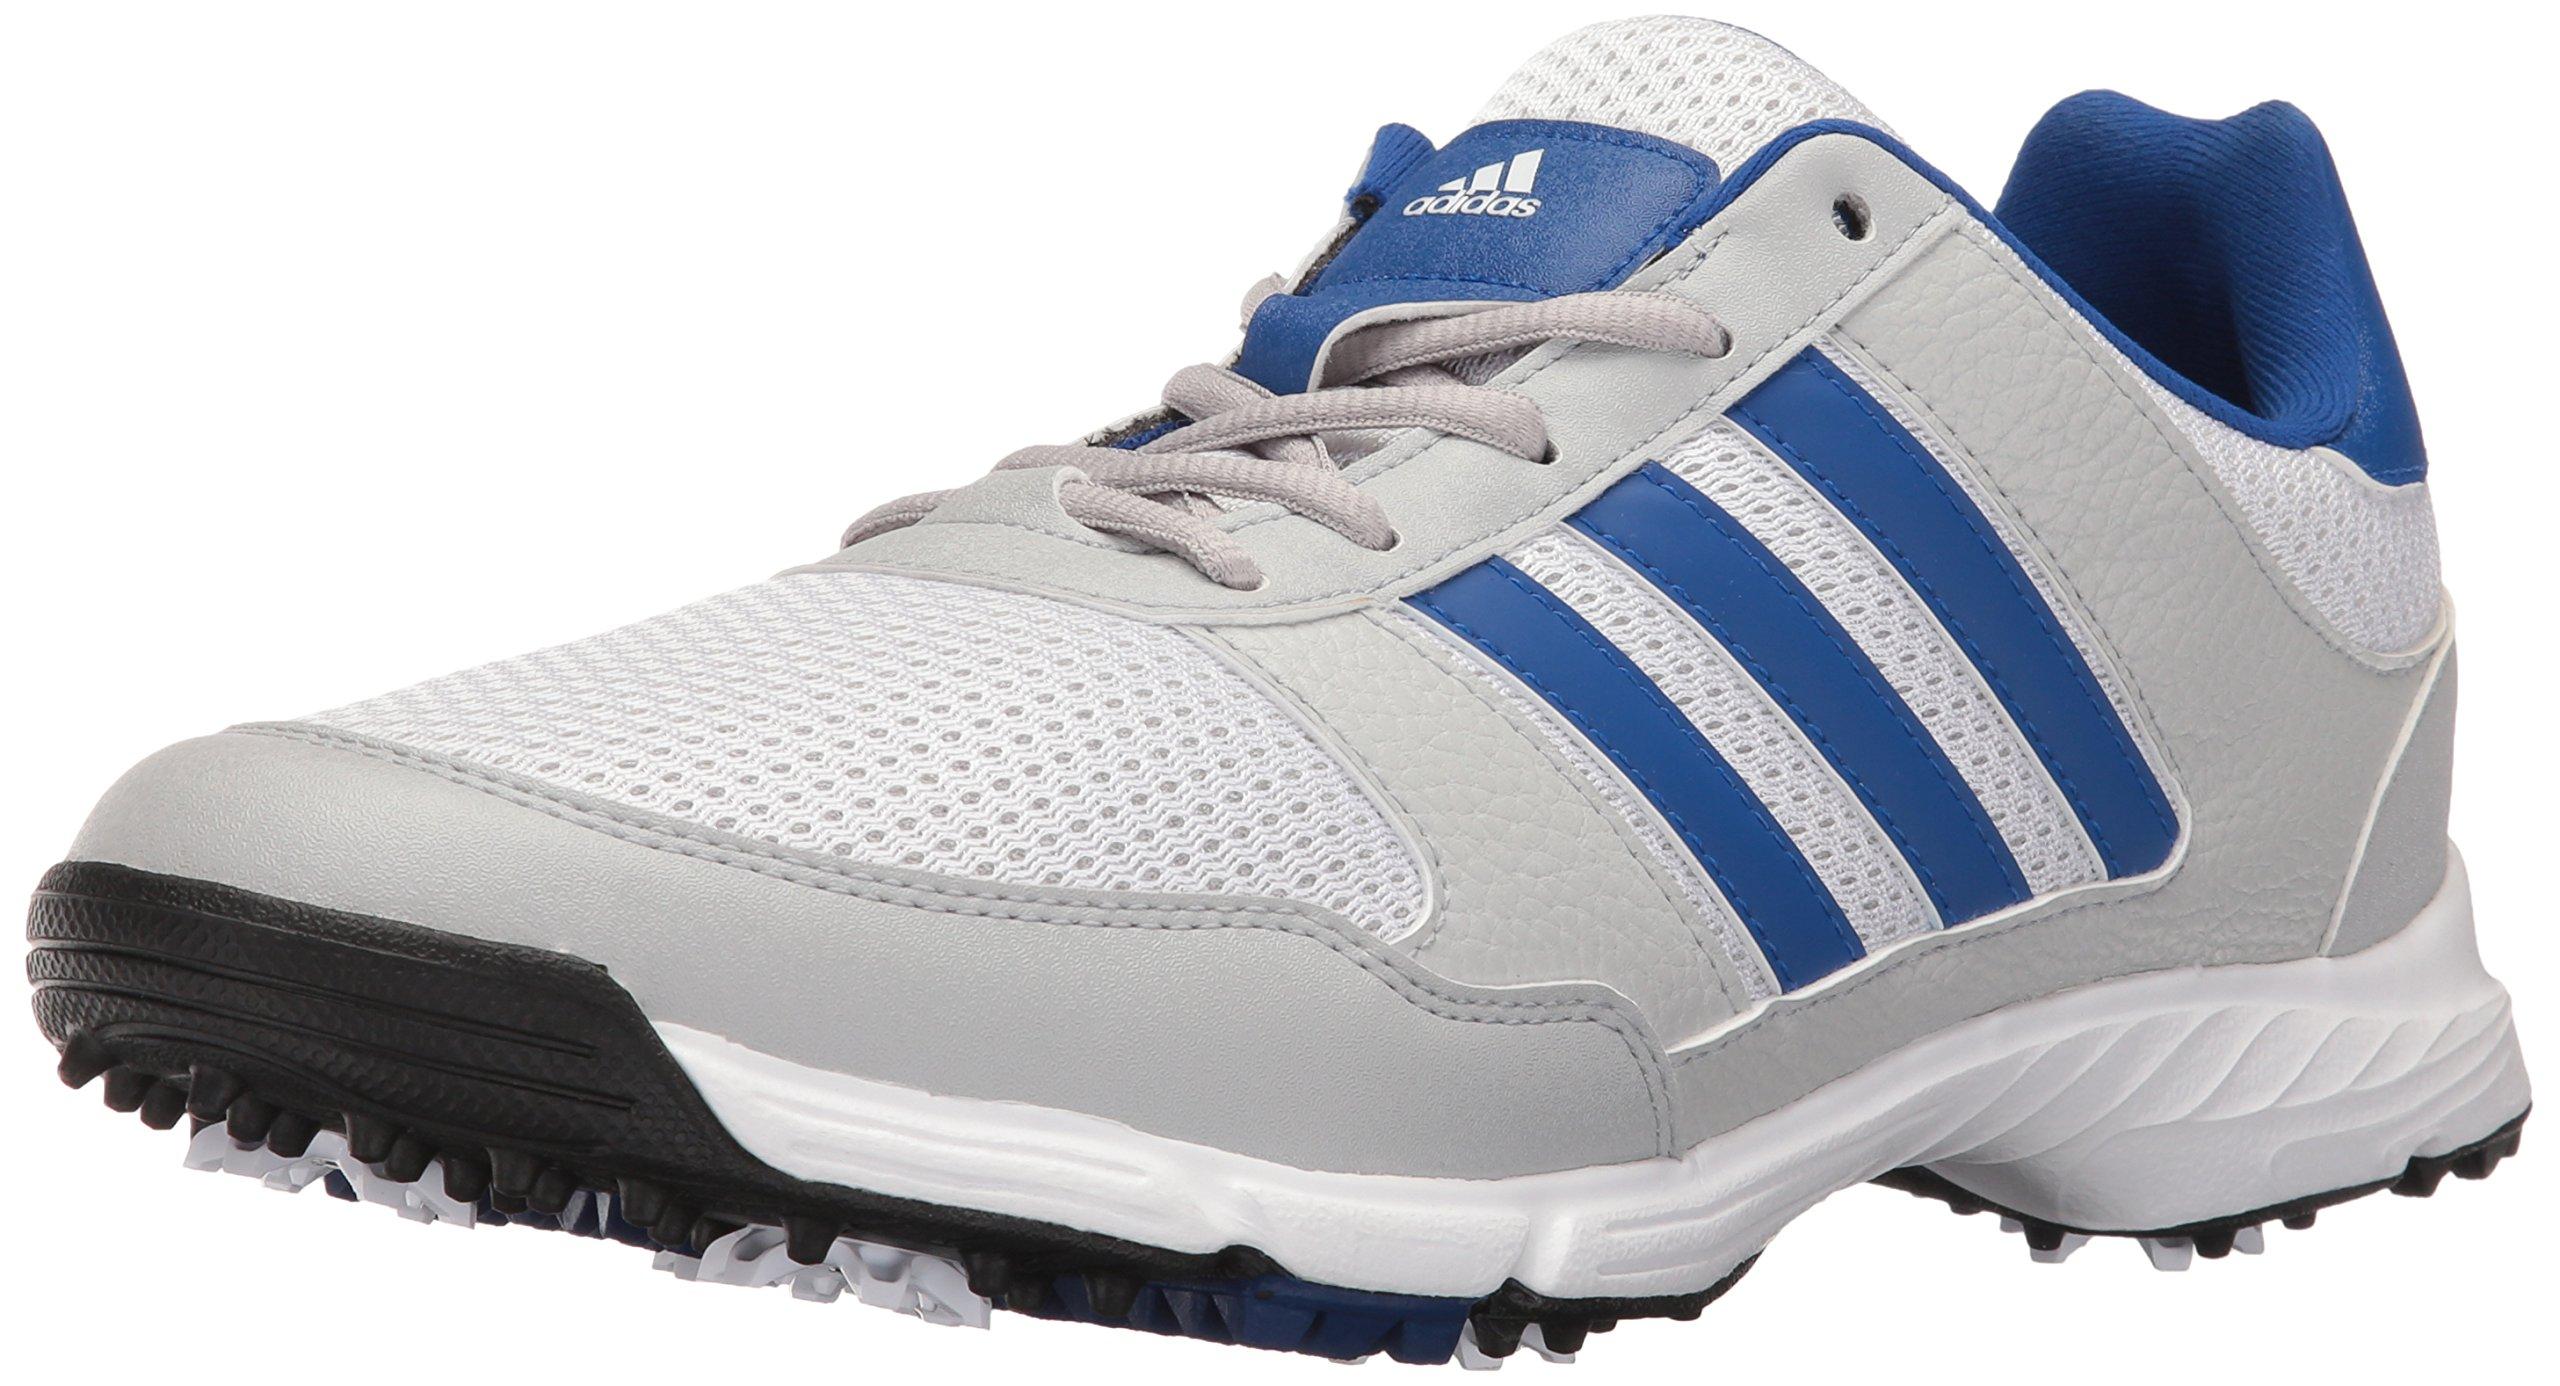 adidas Men's Tech Response 4.0 Golf Shoe, White/Royal, 10 M US by adidas